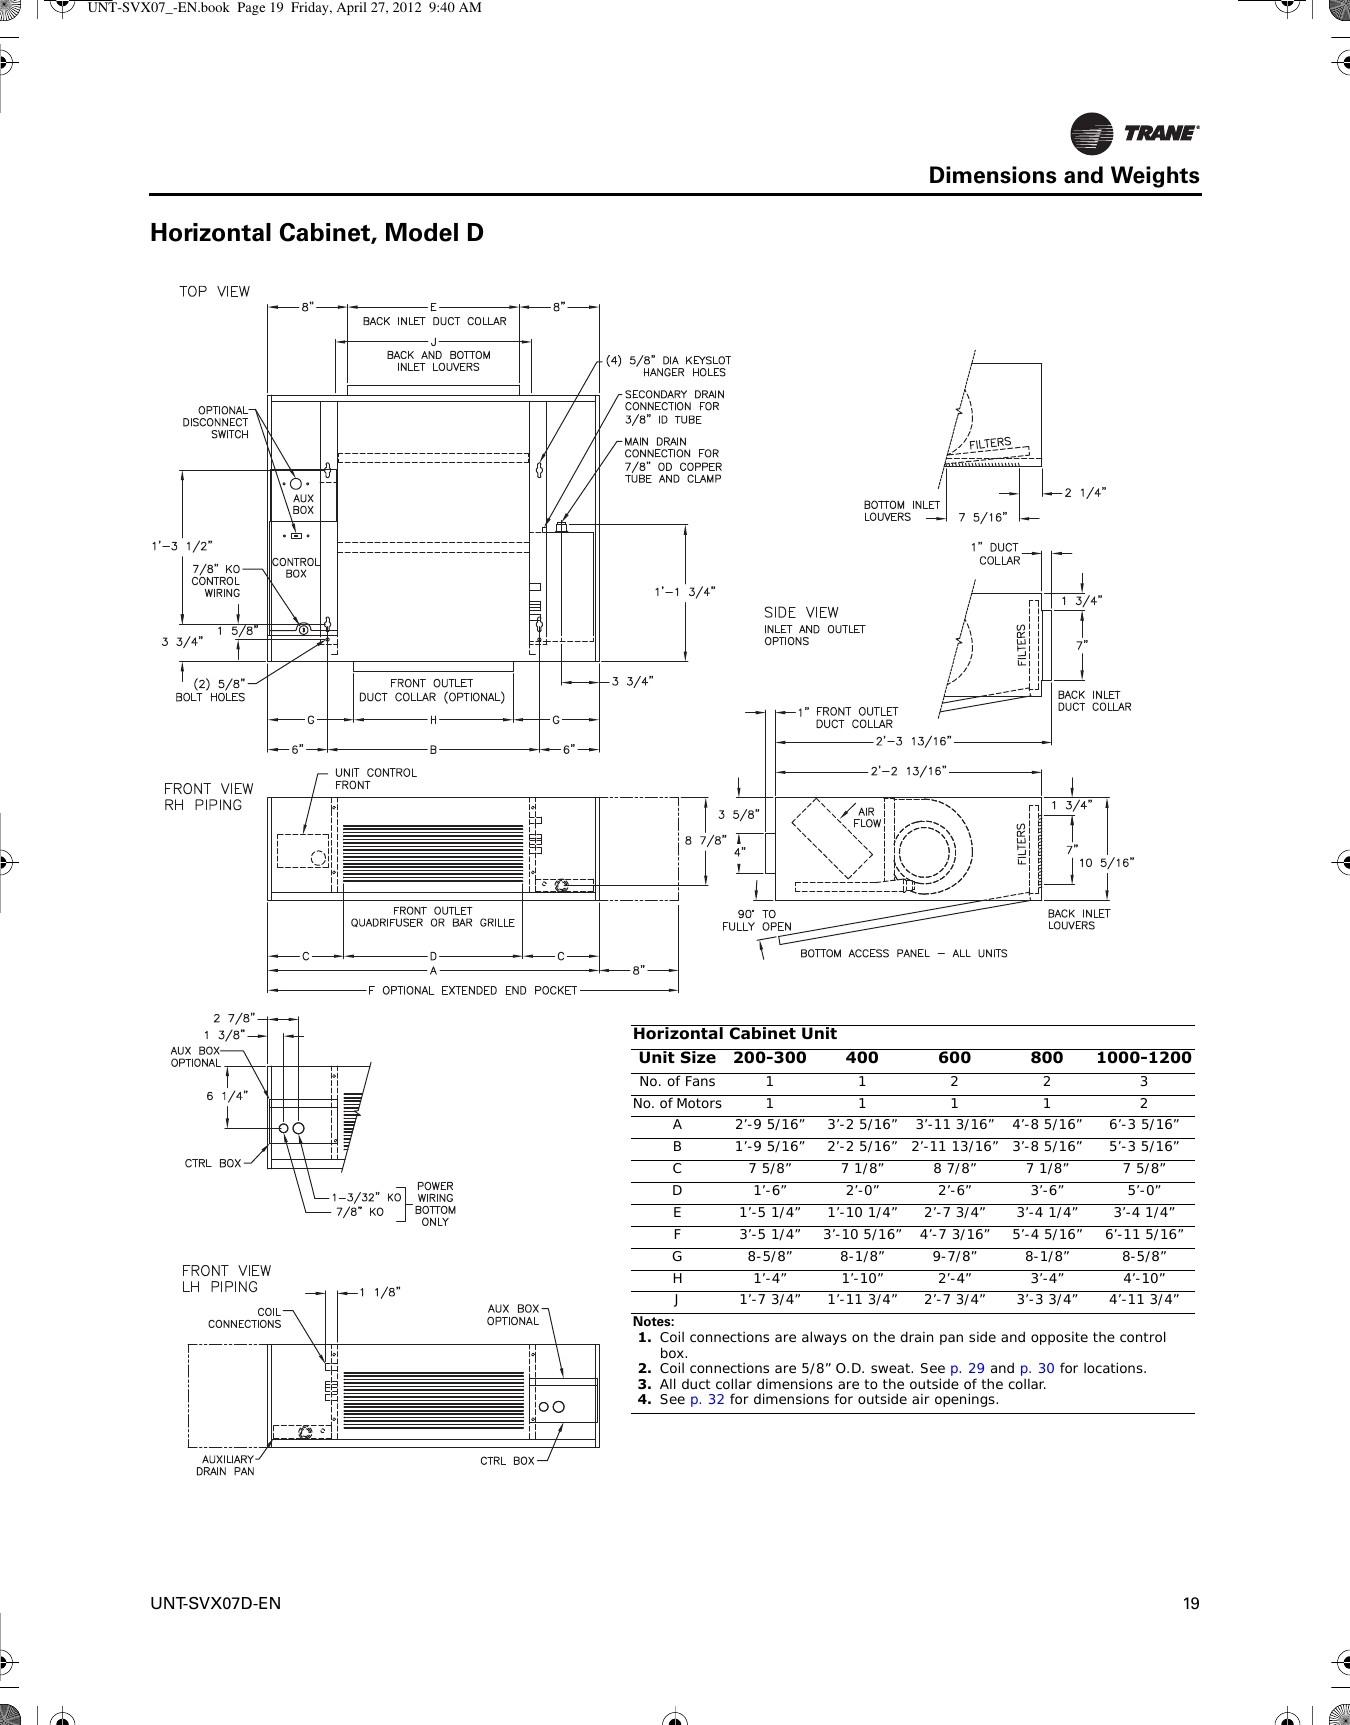 dometicfort control center 2 wiring diagram